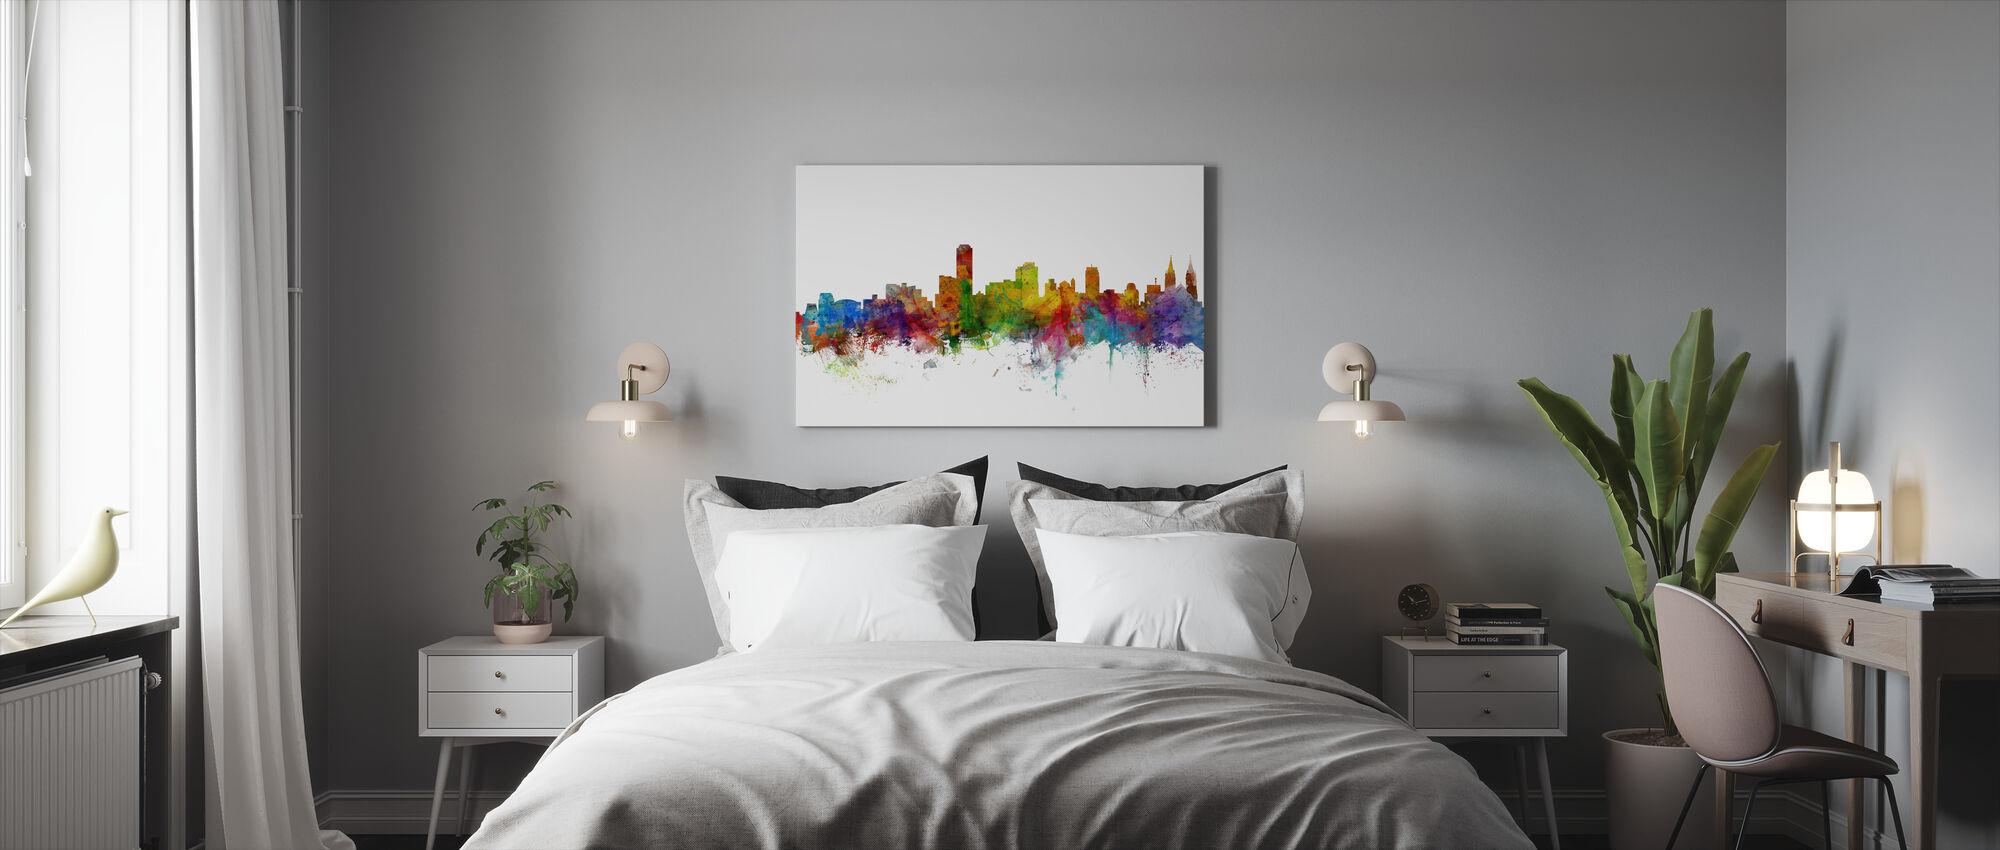 Adelaide Australia Skyline - Canvas print - Bedroom